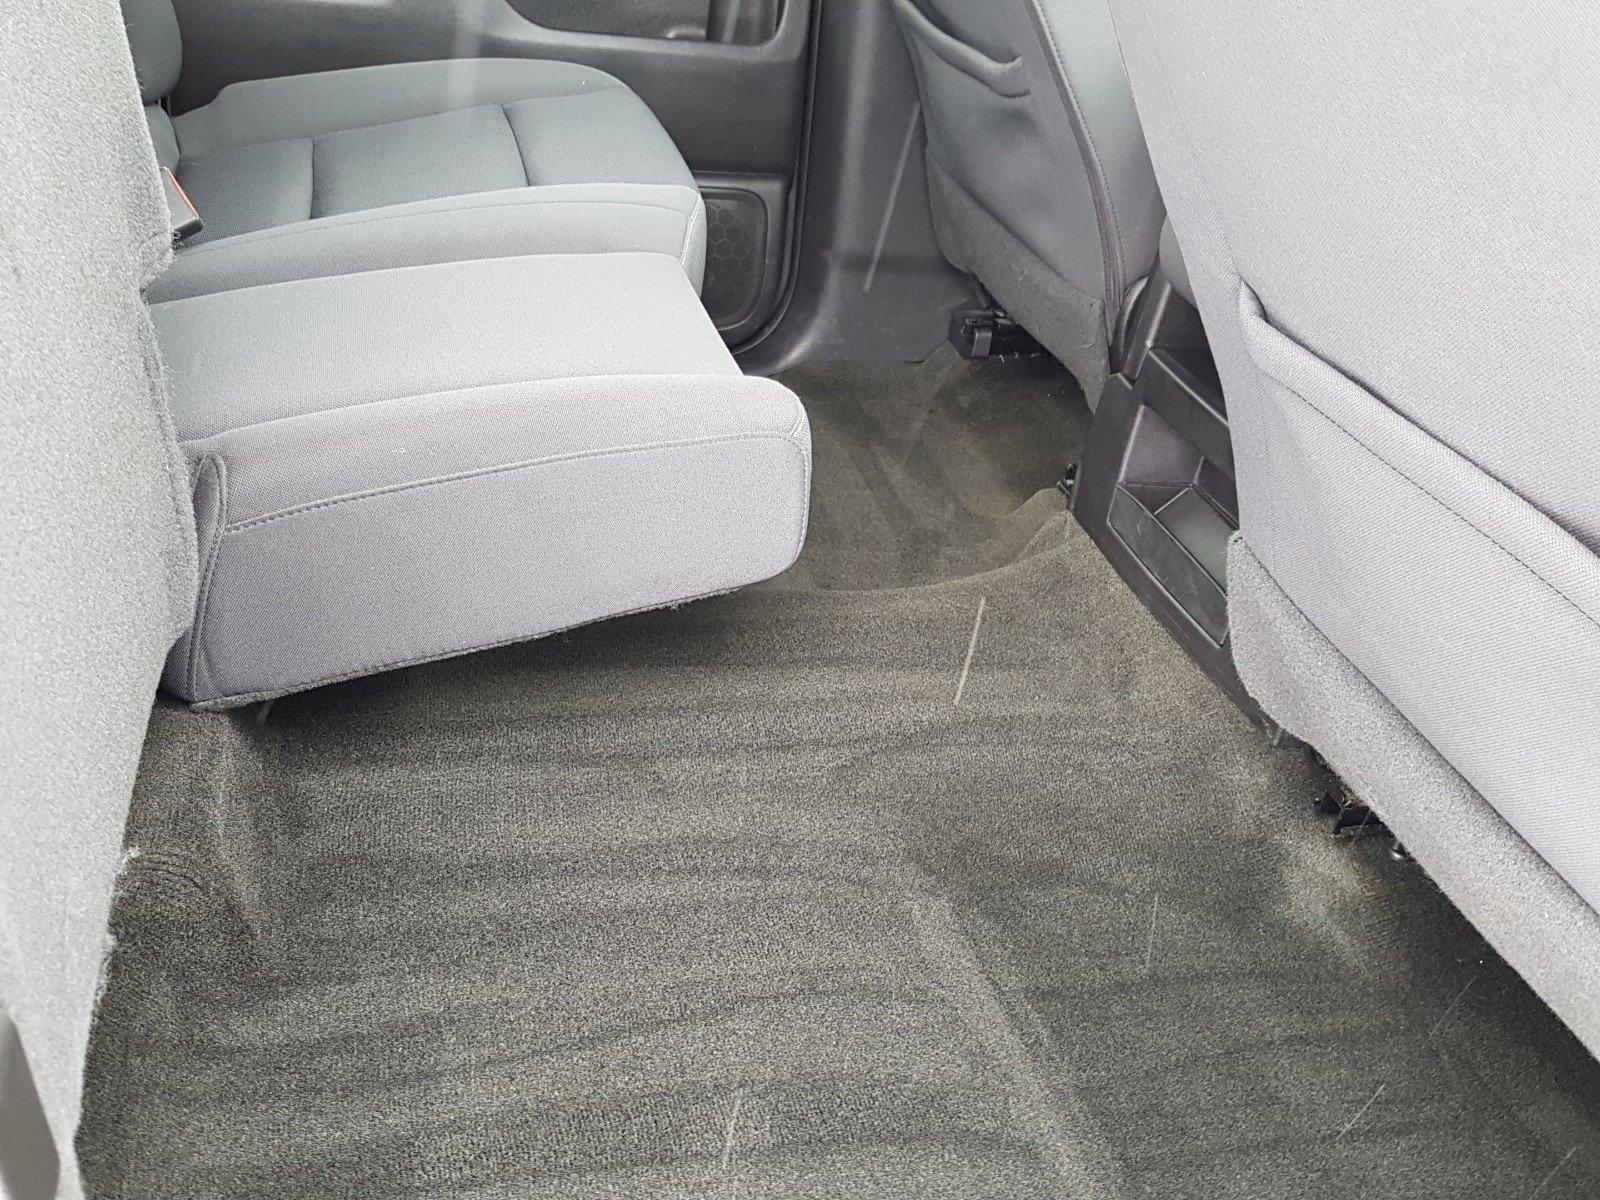 2017 GMC Sierra 1500 Crew Cab Pickup